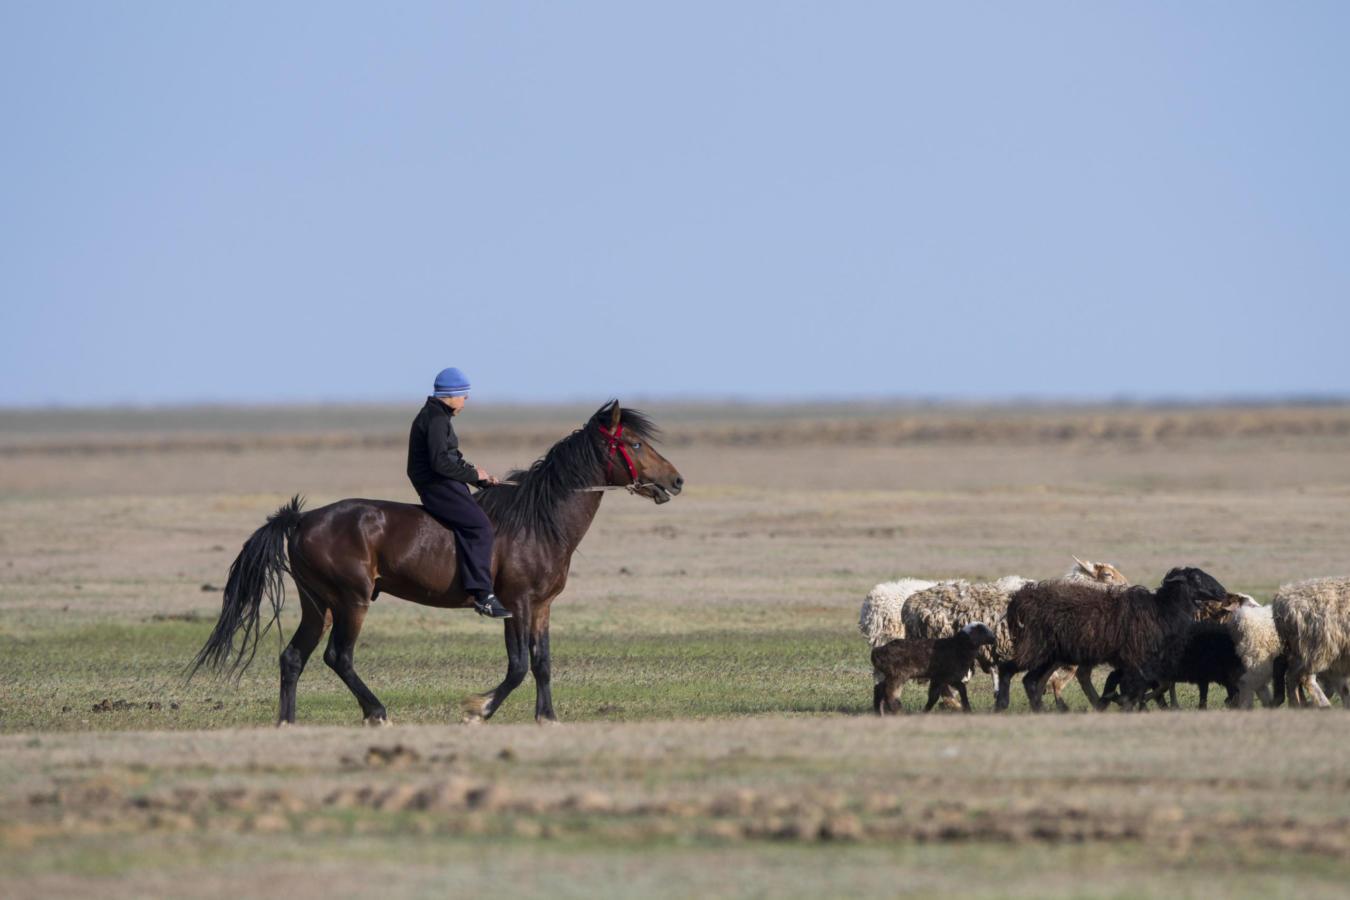 A boy herding sheep from the back of a horse, Kazakhstan